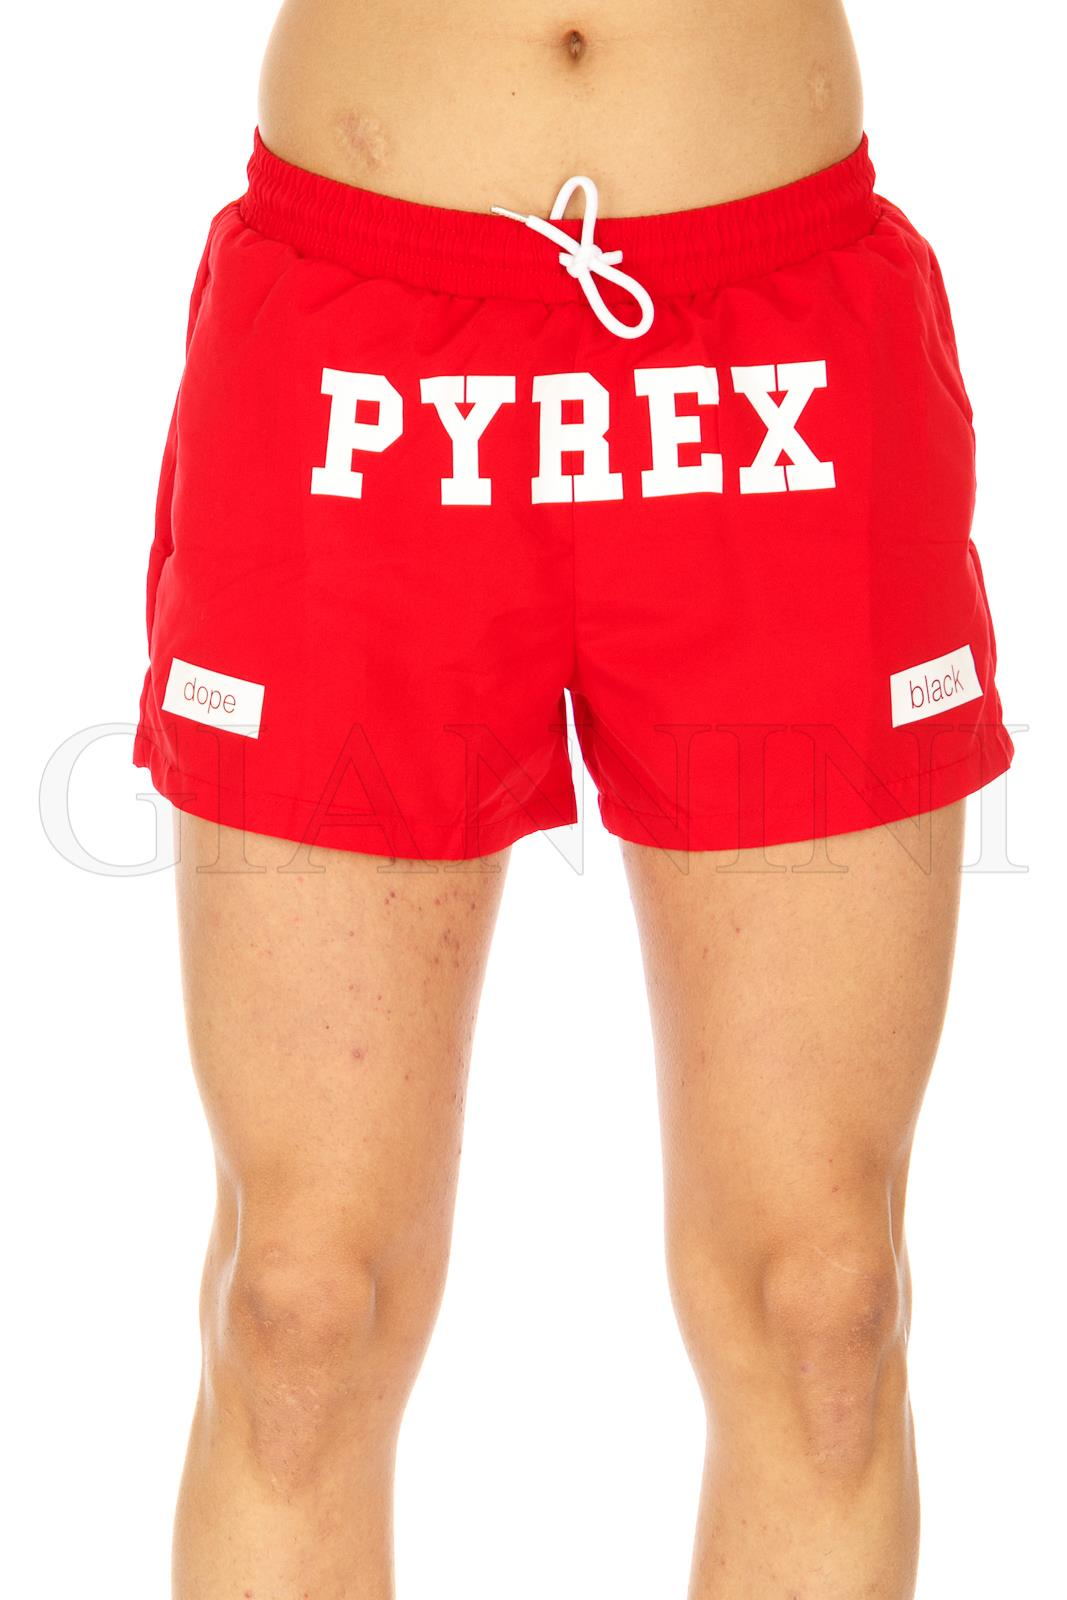 Pyrex Costume Py18050r Giannini Shop